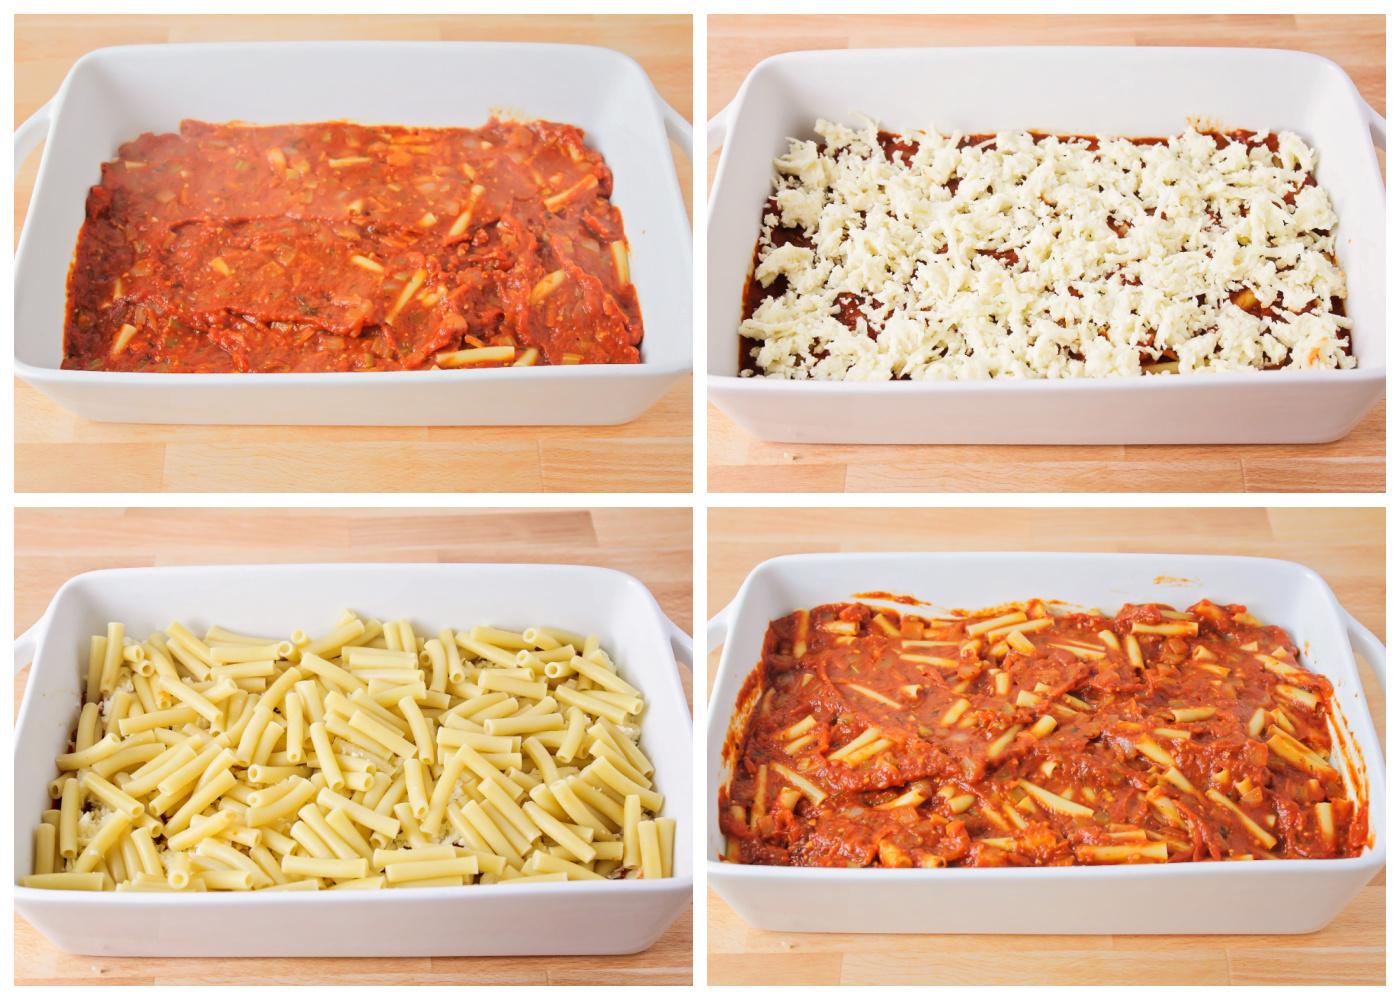 How to make baked ziti - layering pasta, sauce, and cheese